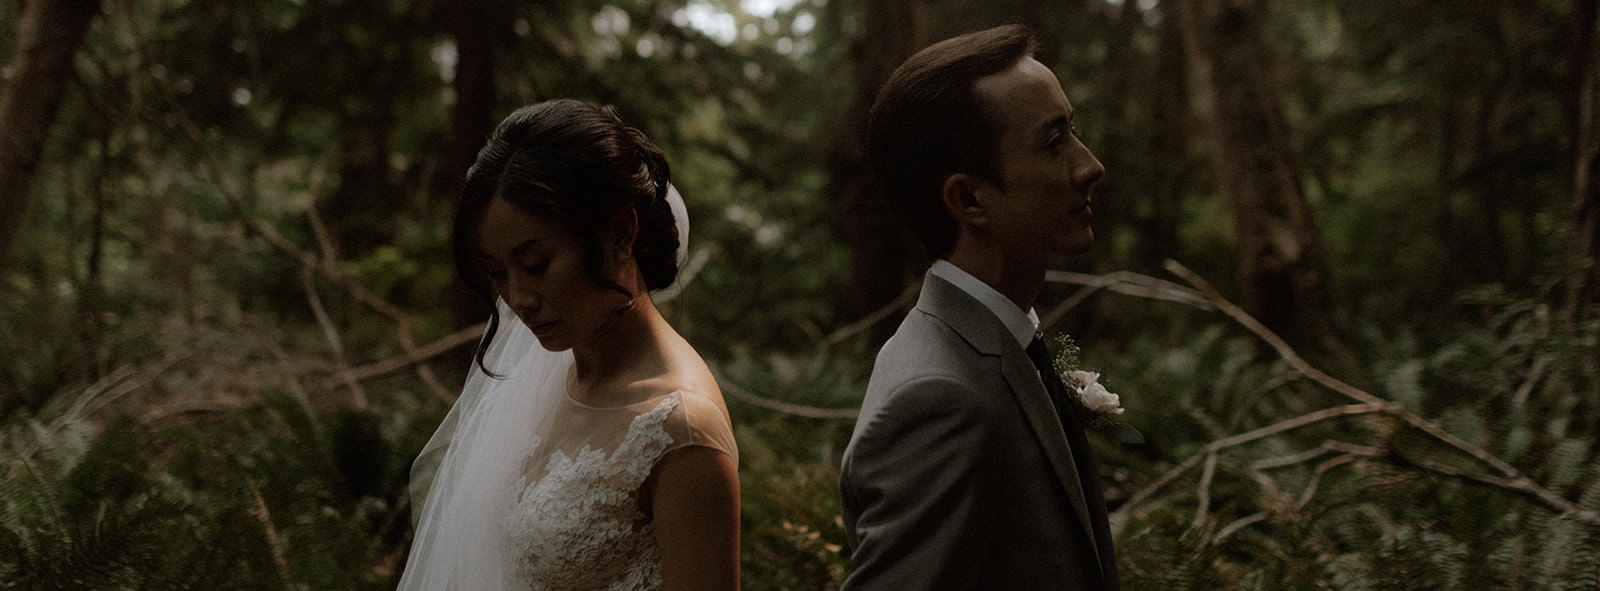 Newlywed Portrait by Tomasz Wagner Photography West Coast Weddings Magazine